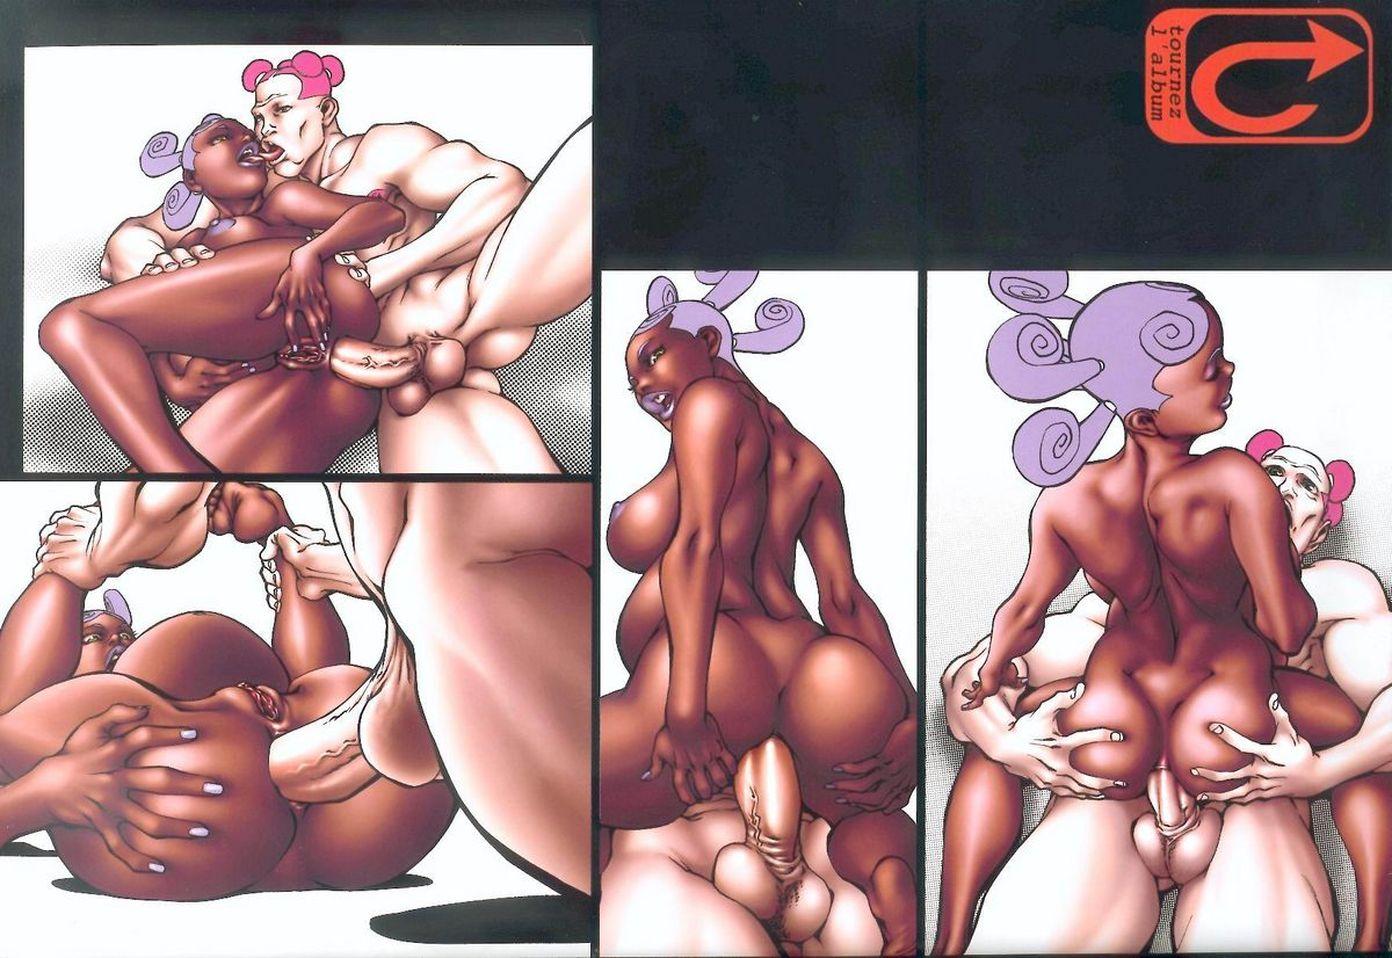 adult xxx cartoons - Anime Cartoon Hardcore Hentai. xxx cartoon videos